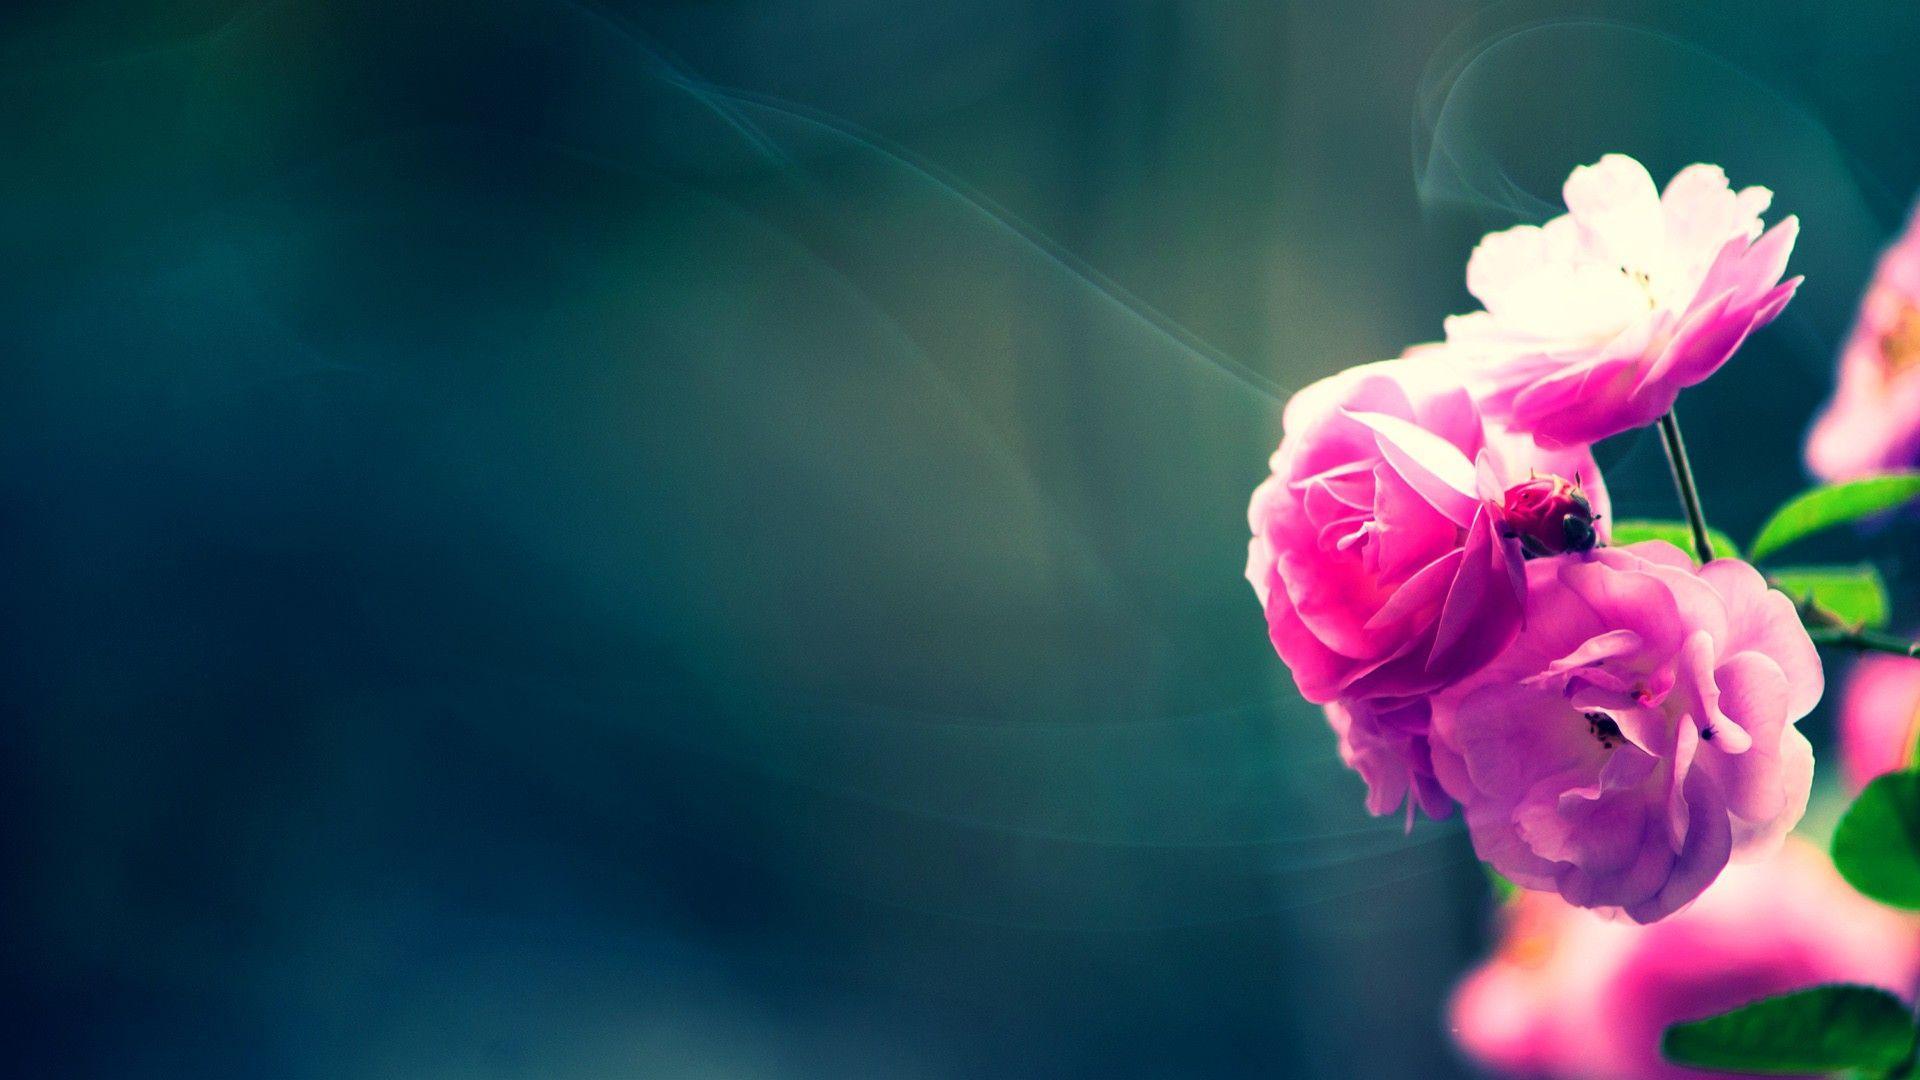 Flower Hd Wallpapers Top Free Flower Hd Backgrounds